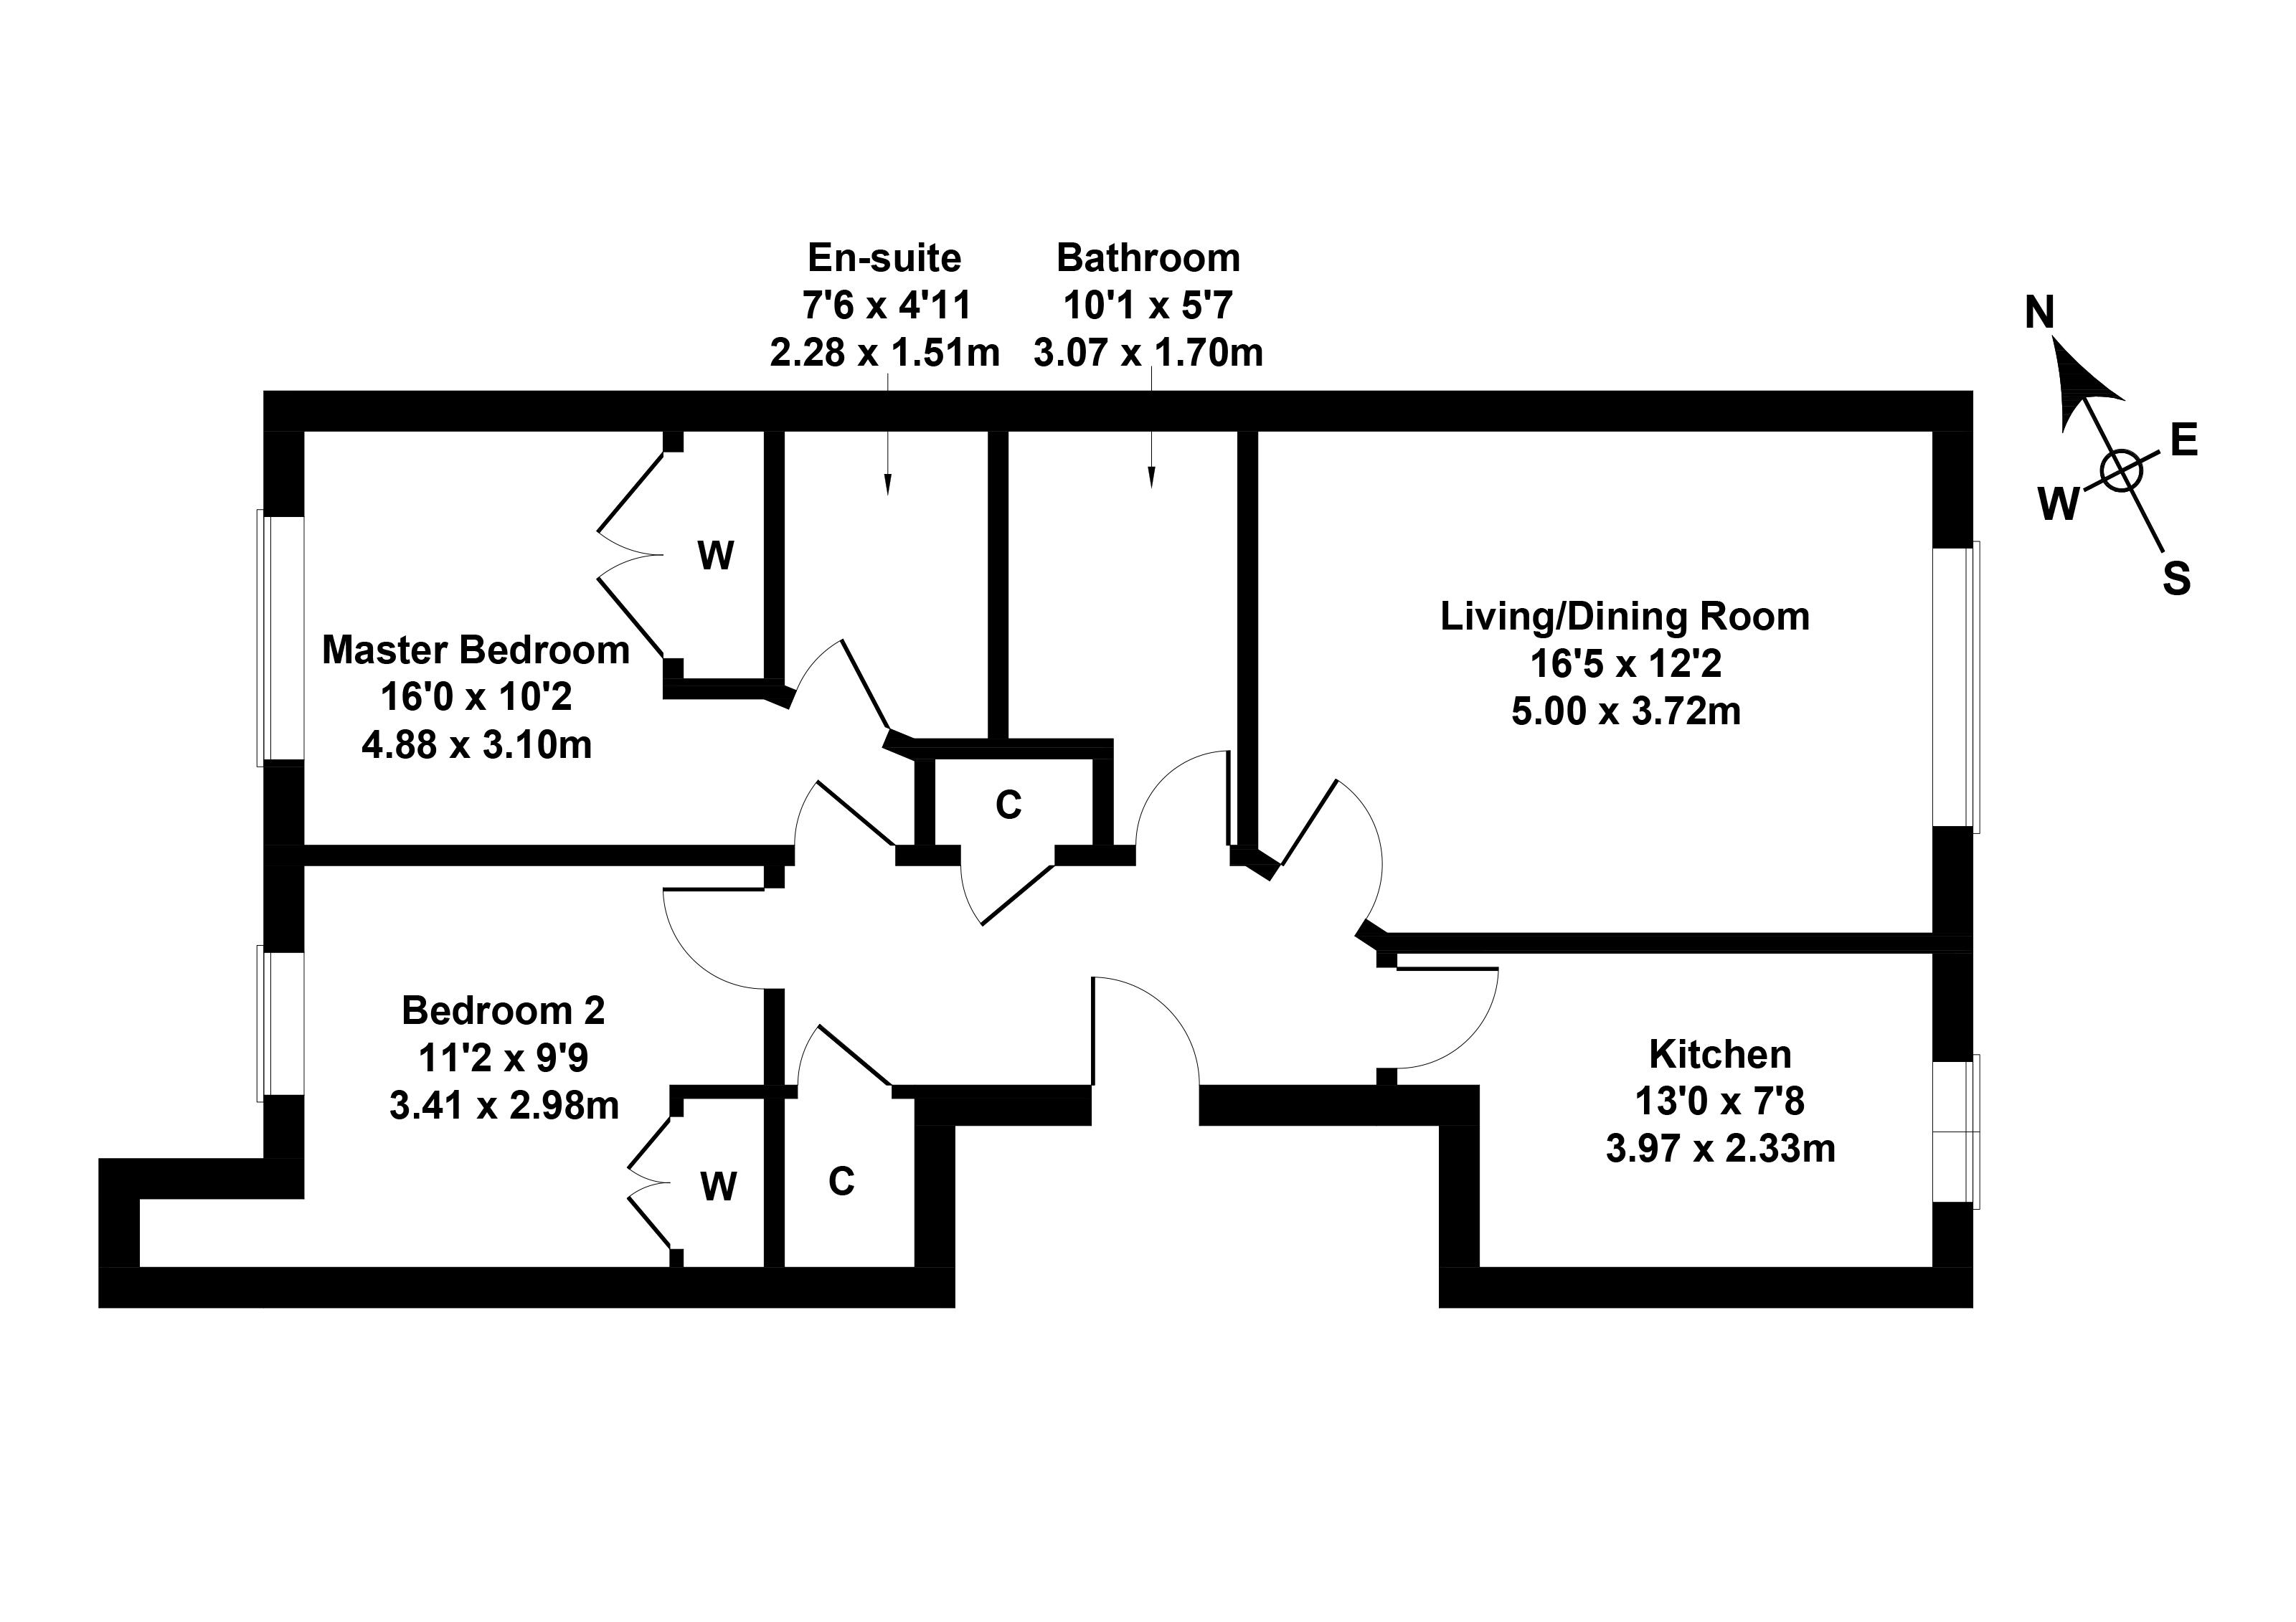 Floorplan 1 of 16/6, Murano Place, Leith, Edinburgh, EH7 5HG